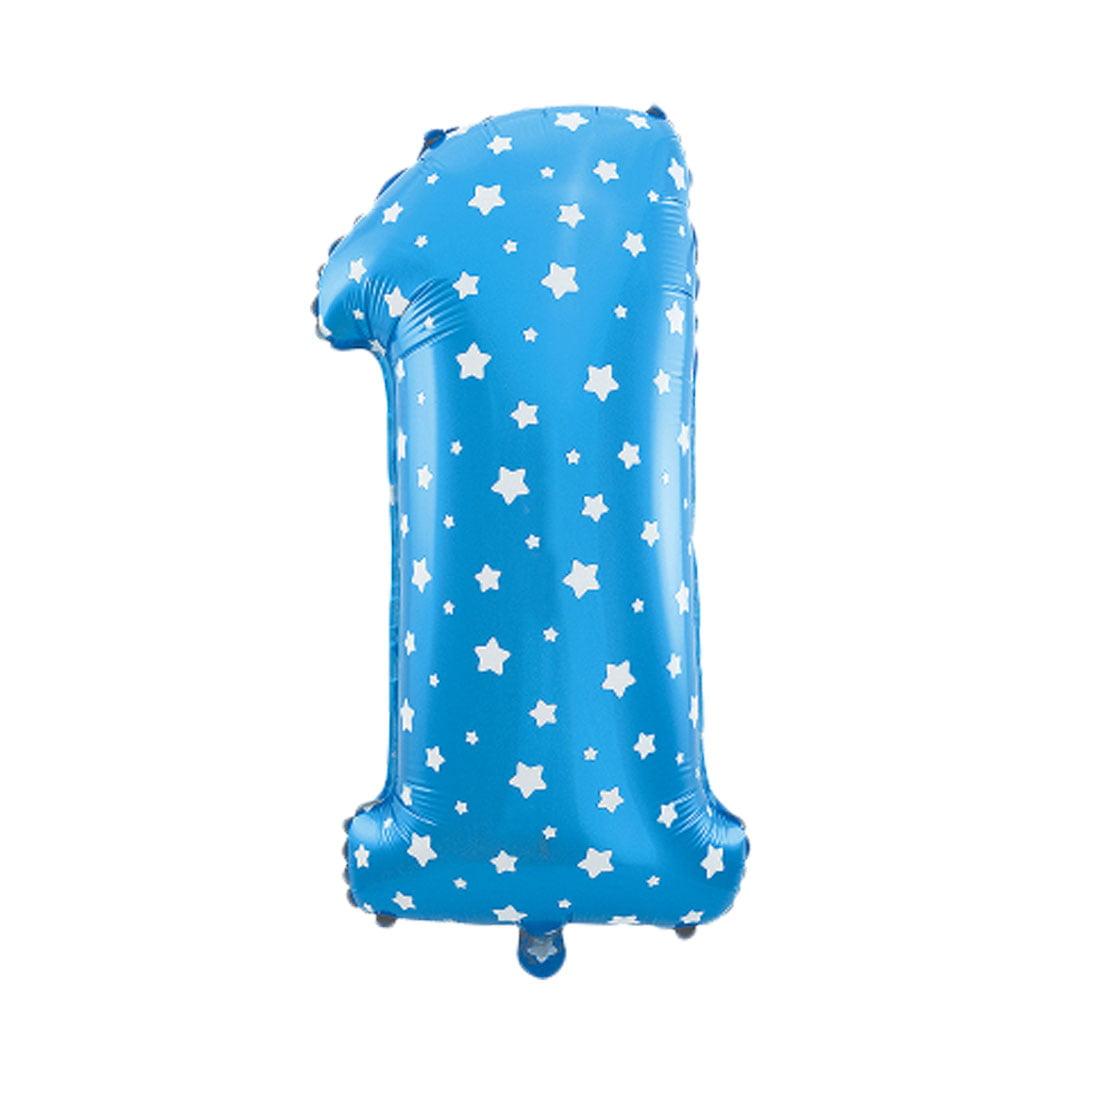 "Unique Bargains 16"" Blue Foil Number 1 Shape Balloon Helium Birthday Wedding Decor"